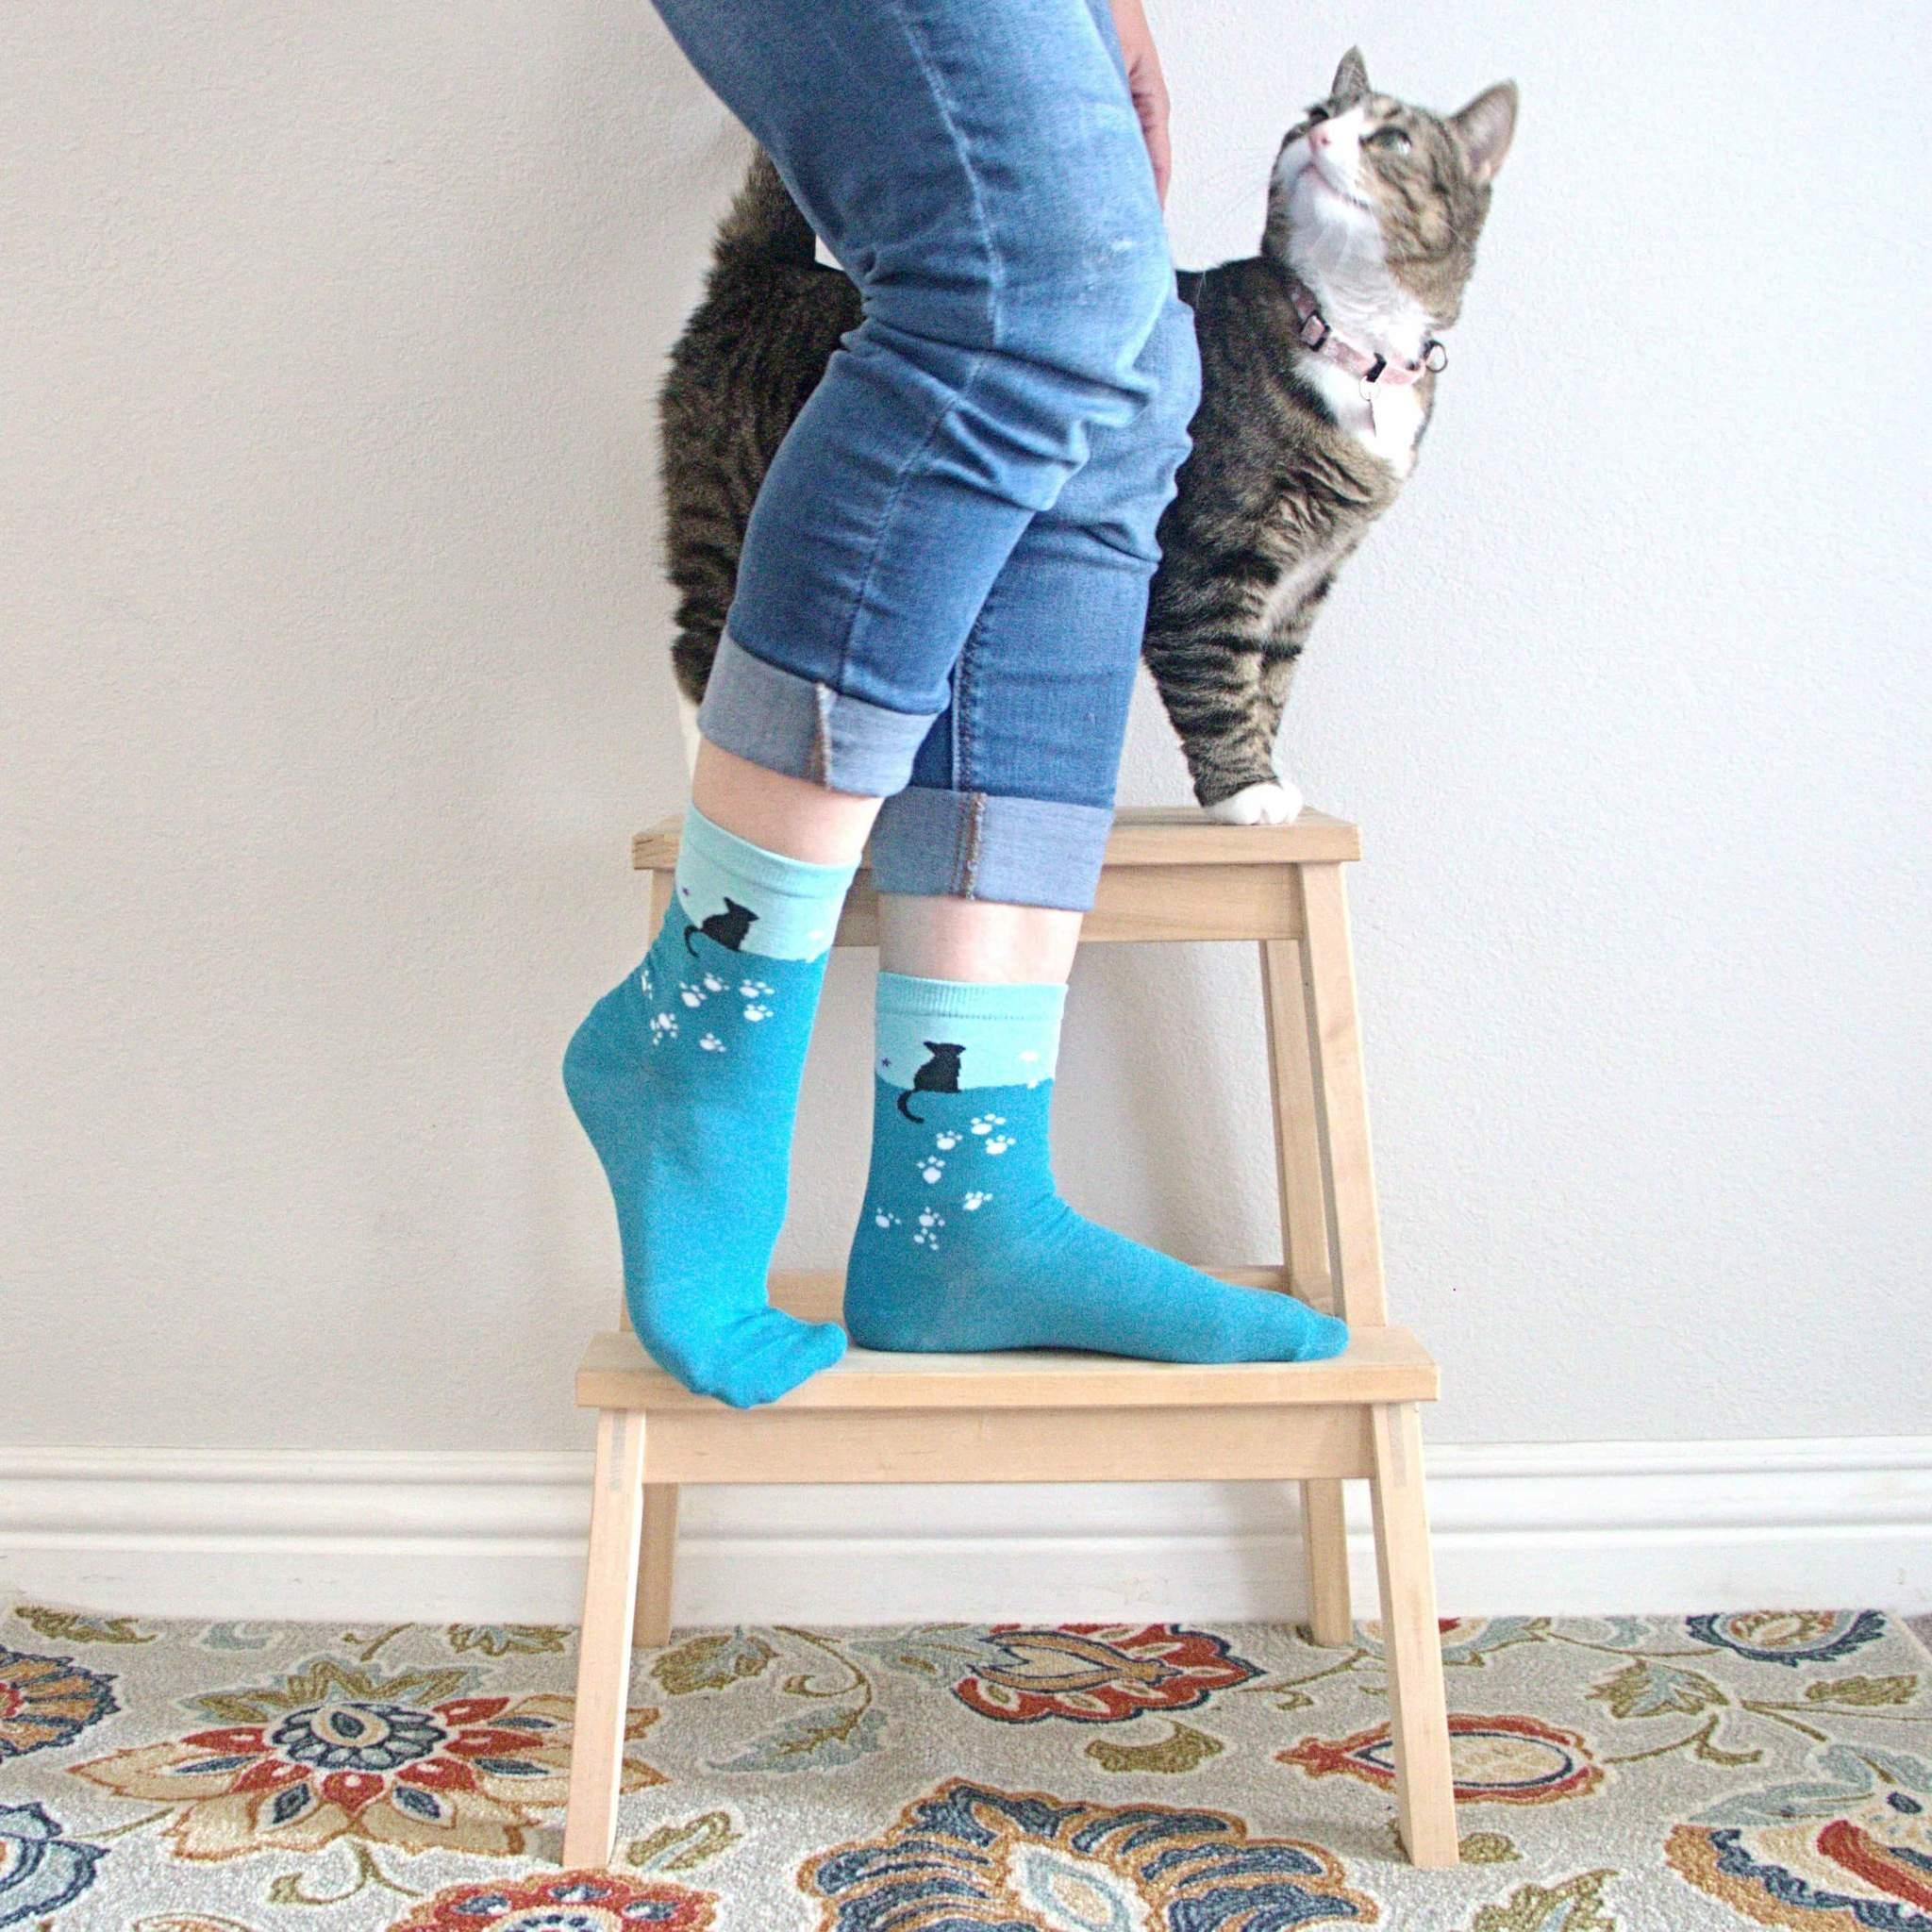 Moony Cat Socks (With images) Cat socks, Cute black cats